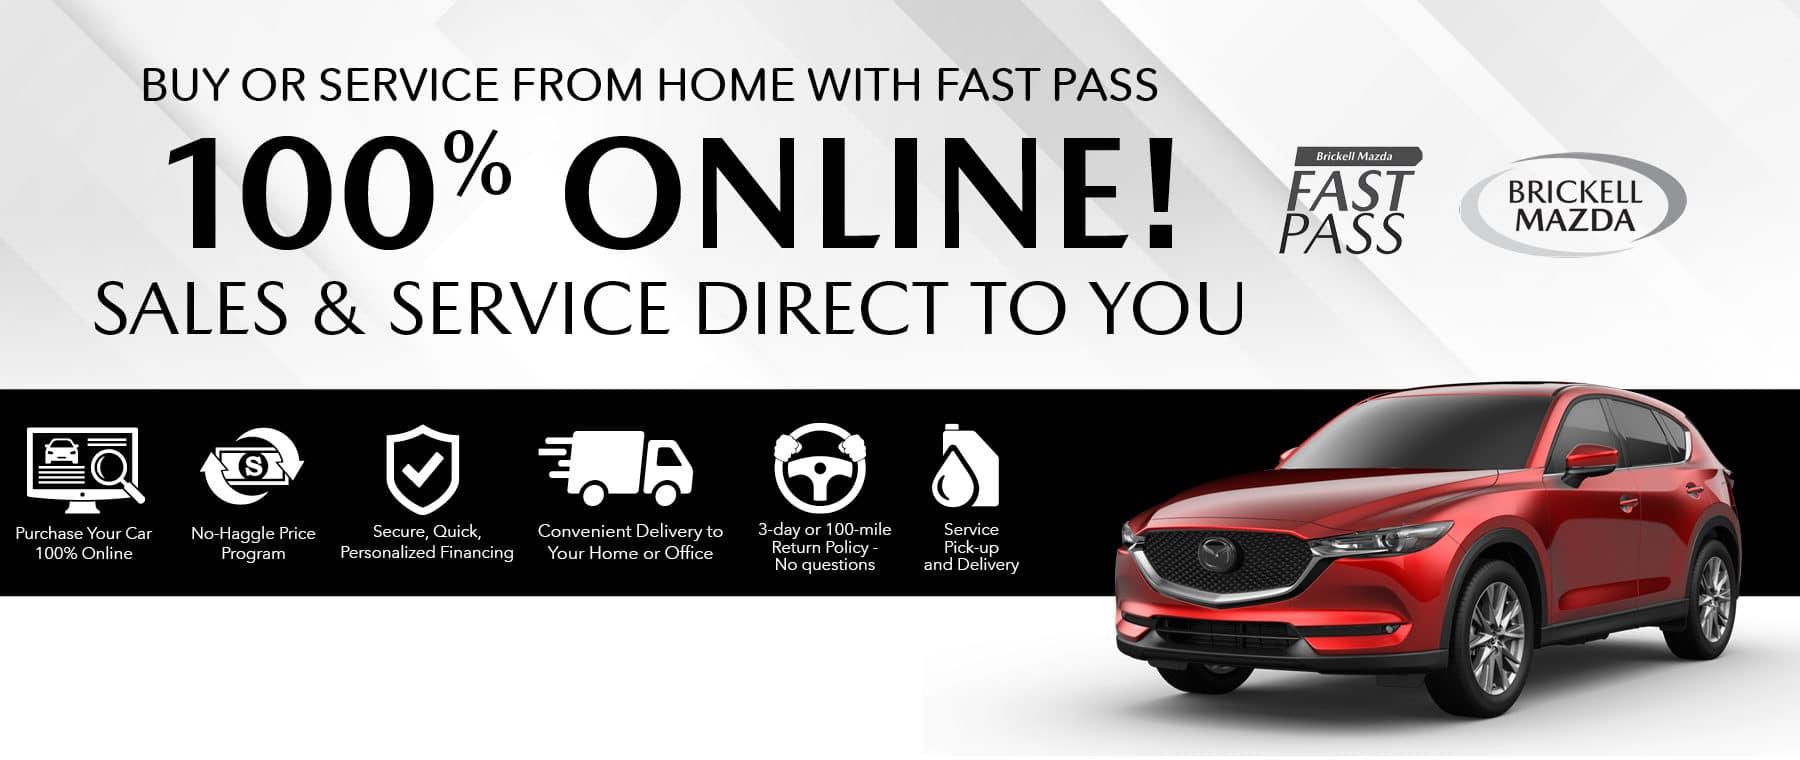 red 2021 Mazda sedan Fast Pass 100% Online Buying